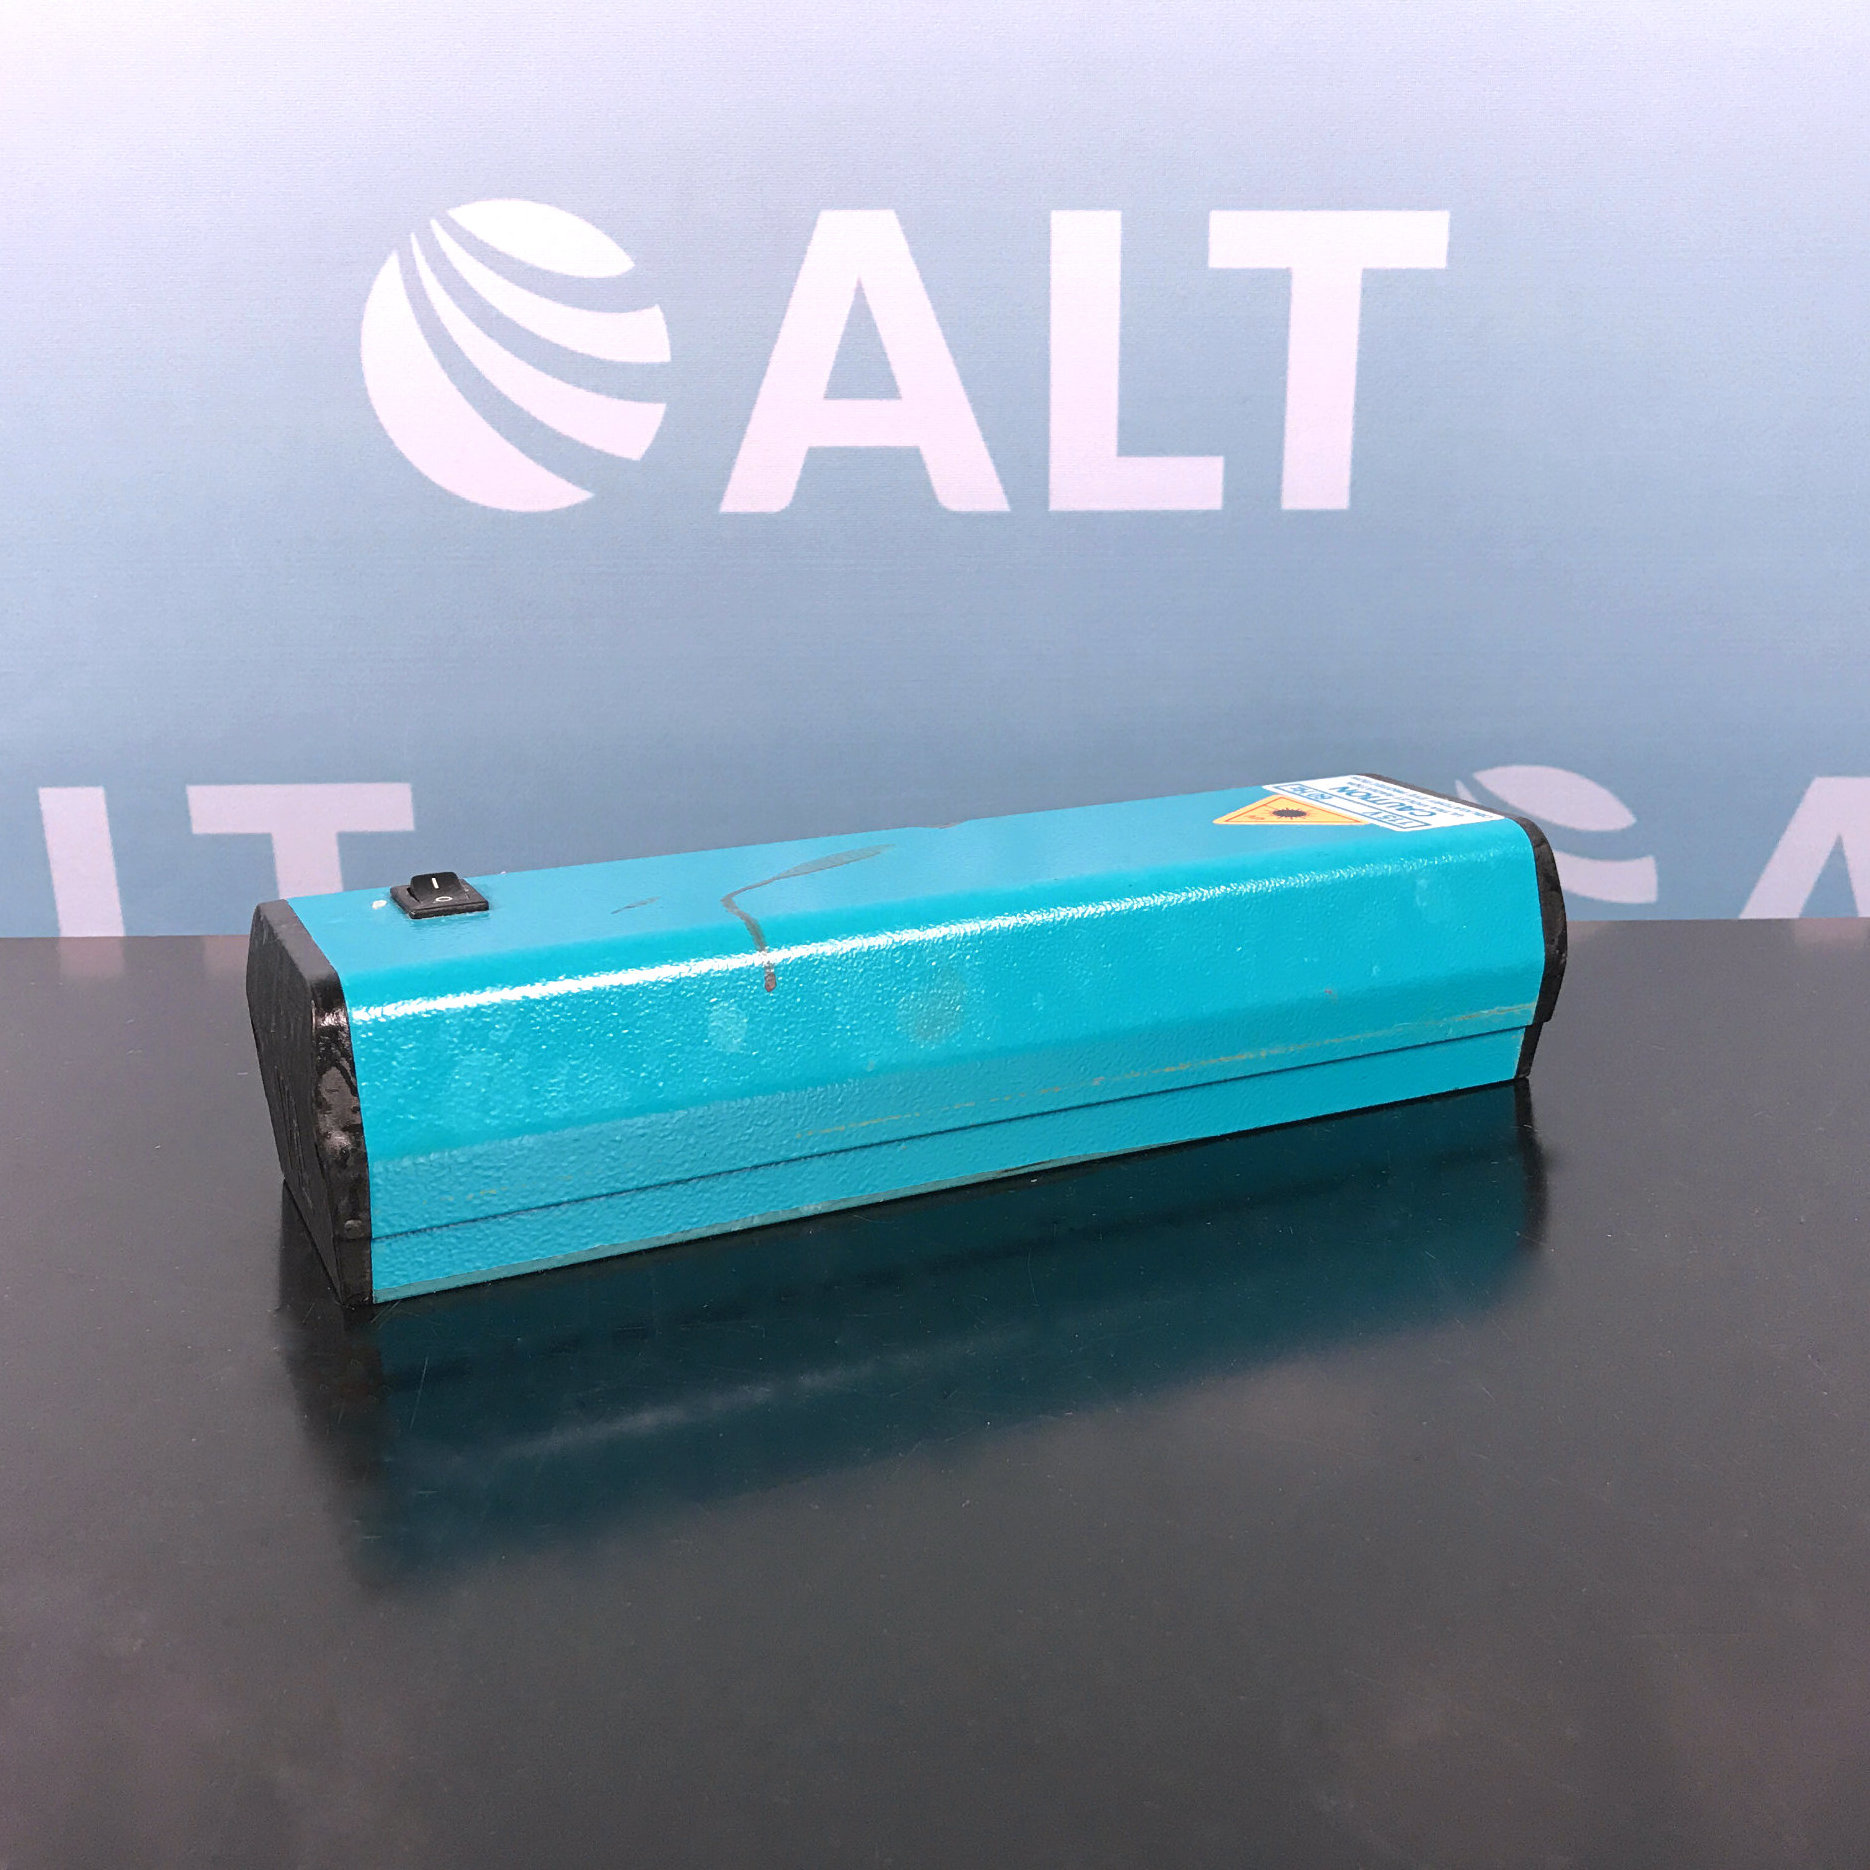 Cole-Parmer 9815 Series High Intensity Ultraviolet UV Lamp 6 Watt Image